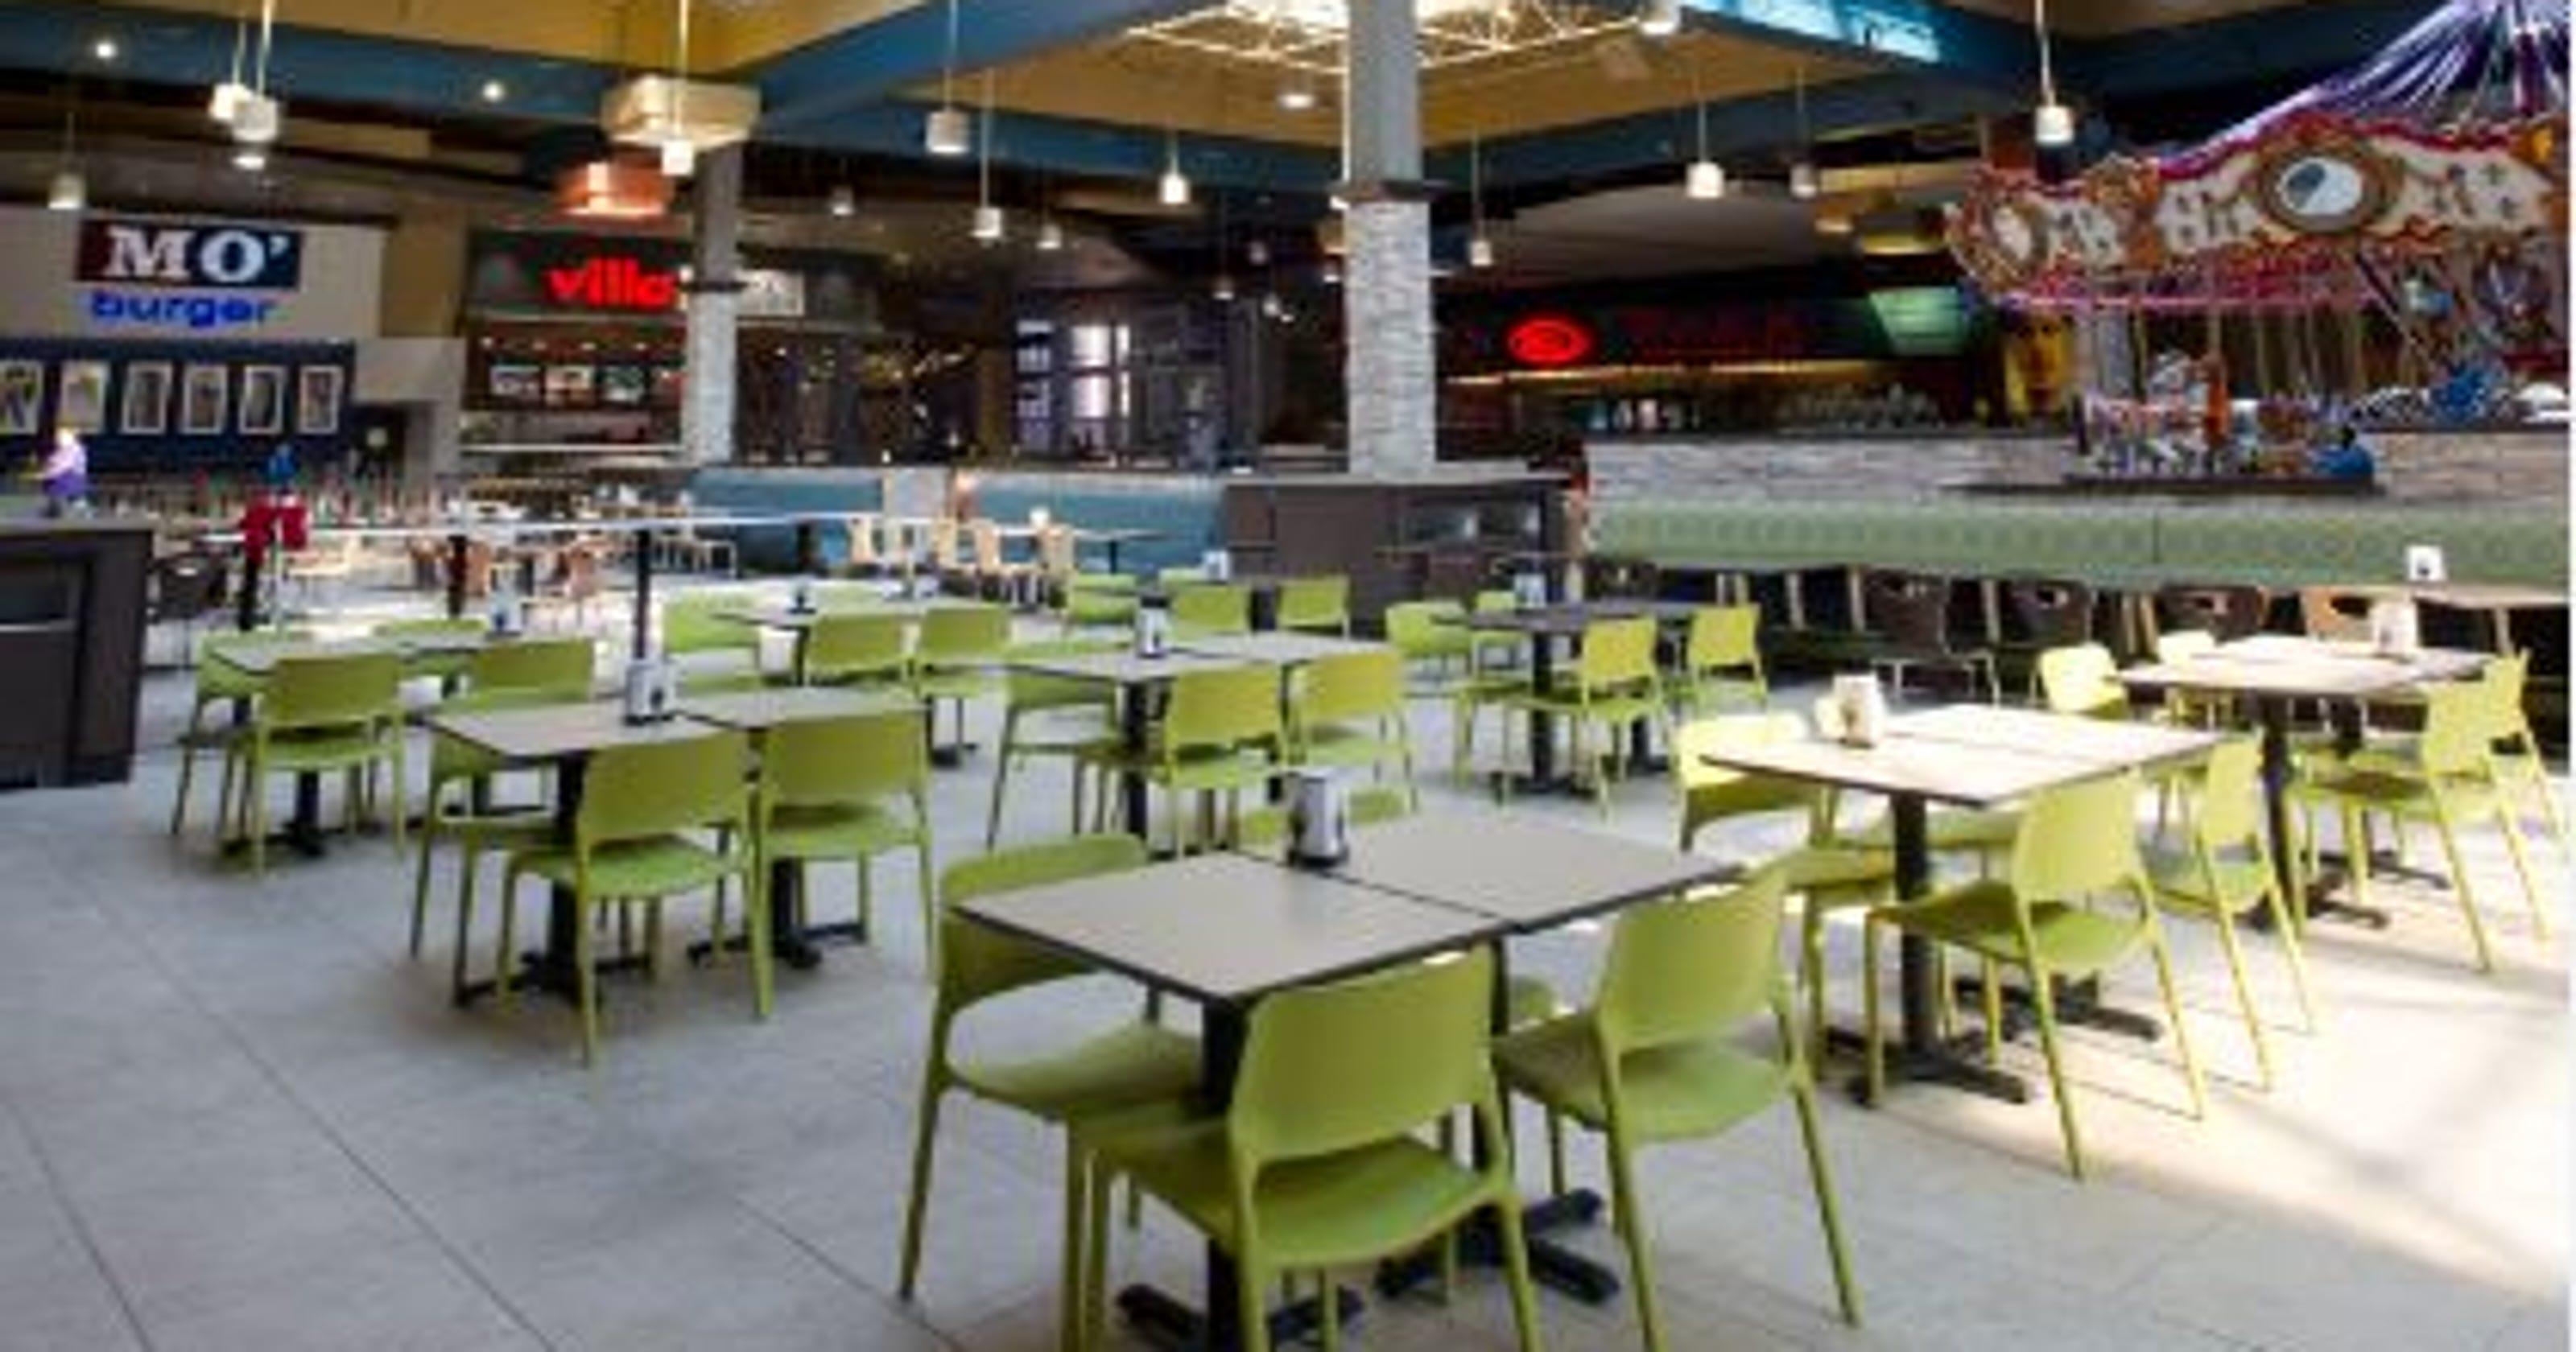 8 New Restaurants At Arizona Mills Renovated Food Court